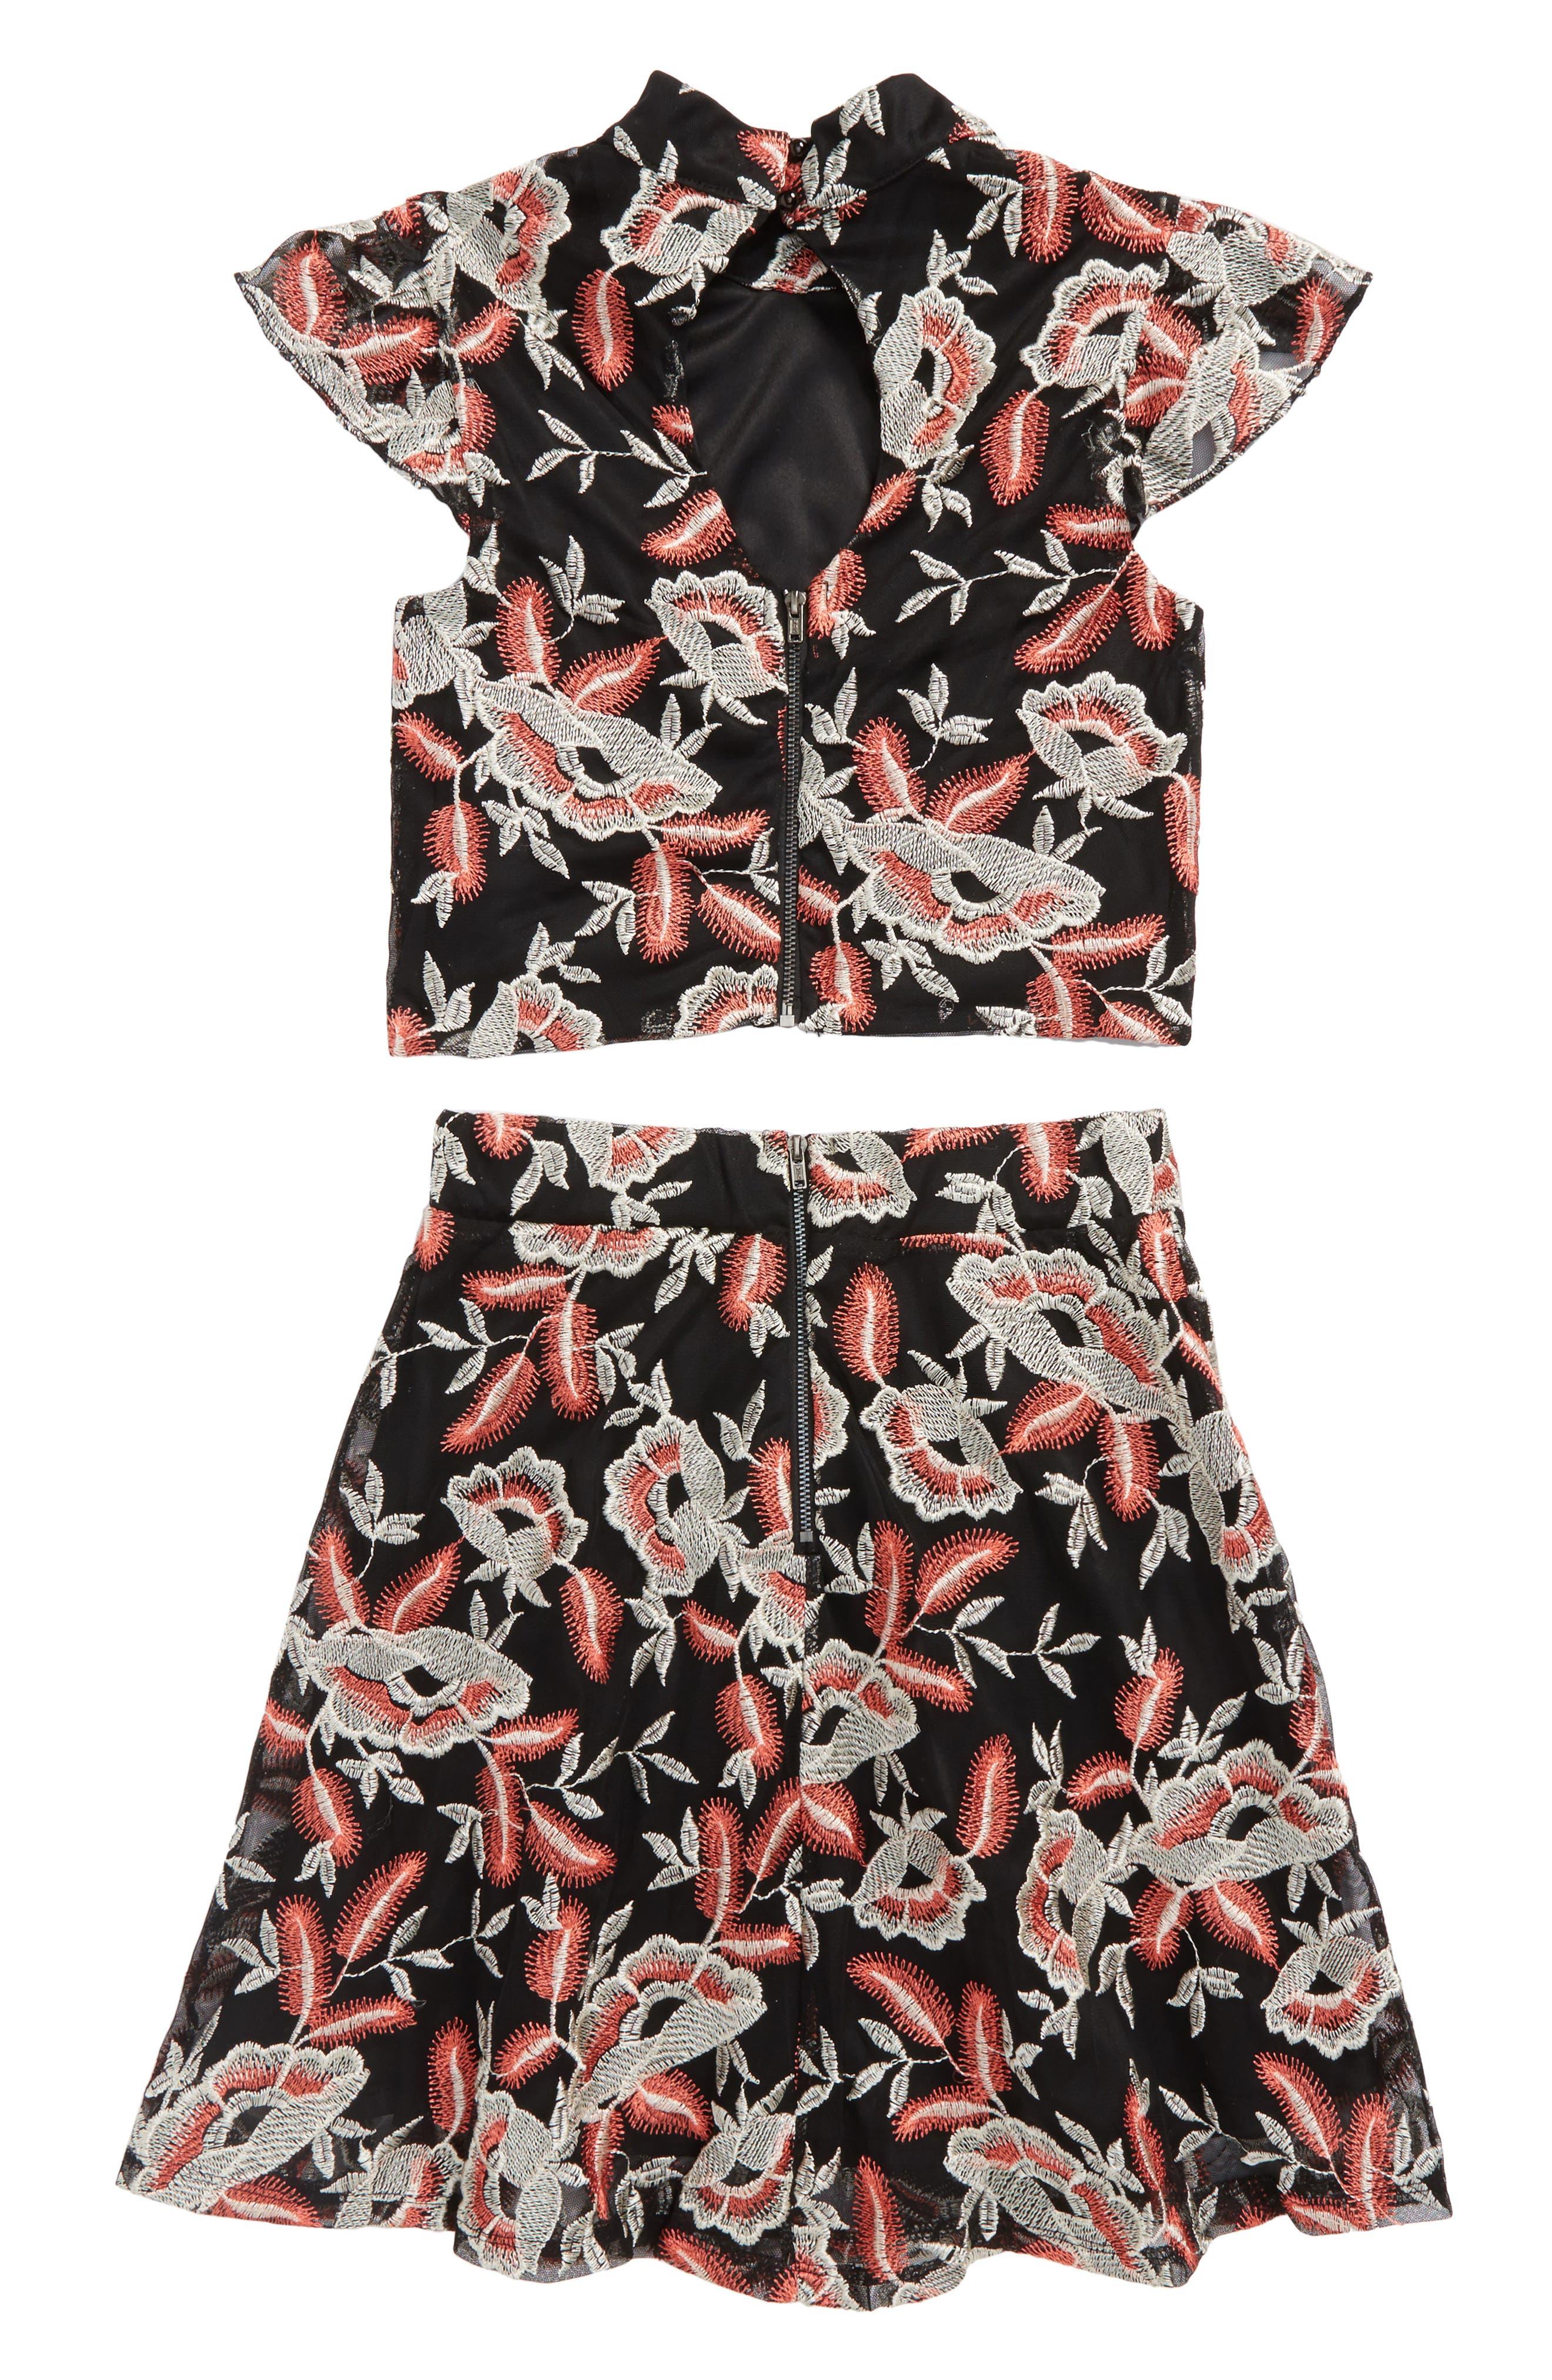 Floral Embroidered Top & Skirt Set,                             Alternate thumbnail 2, color,                             Black